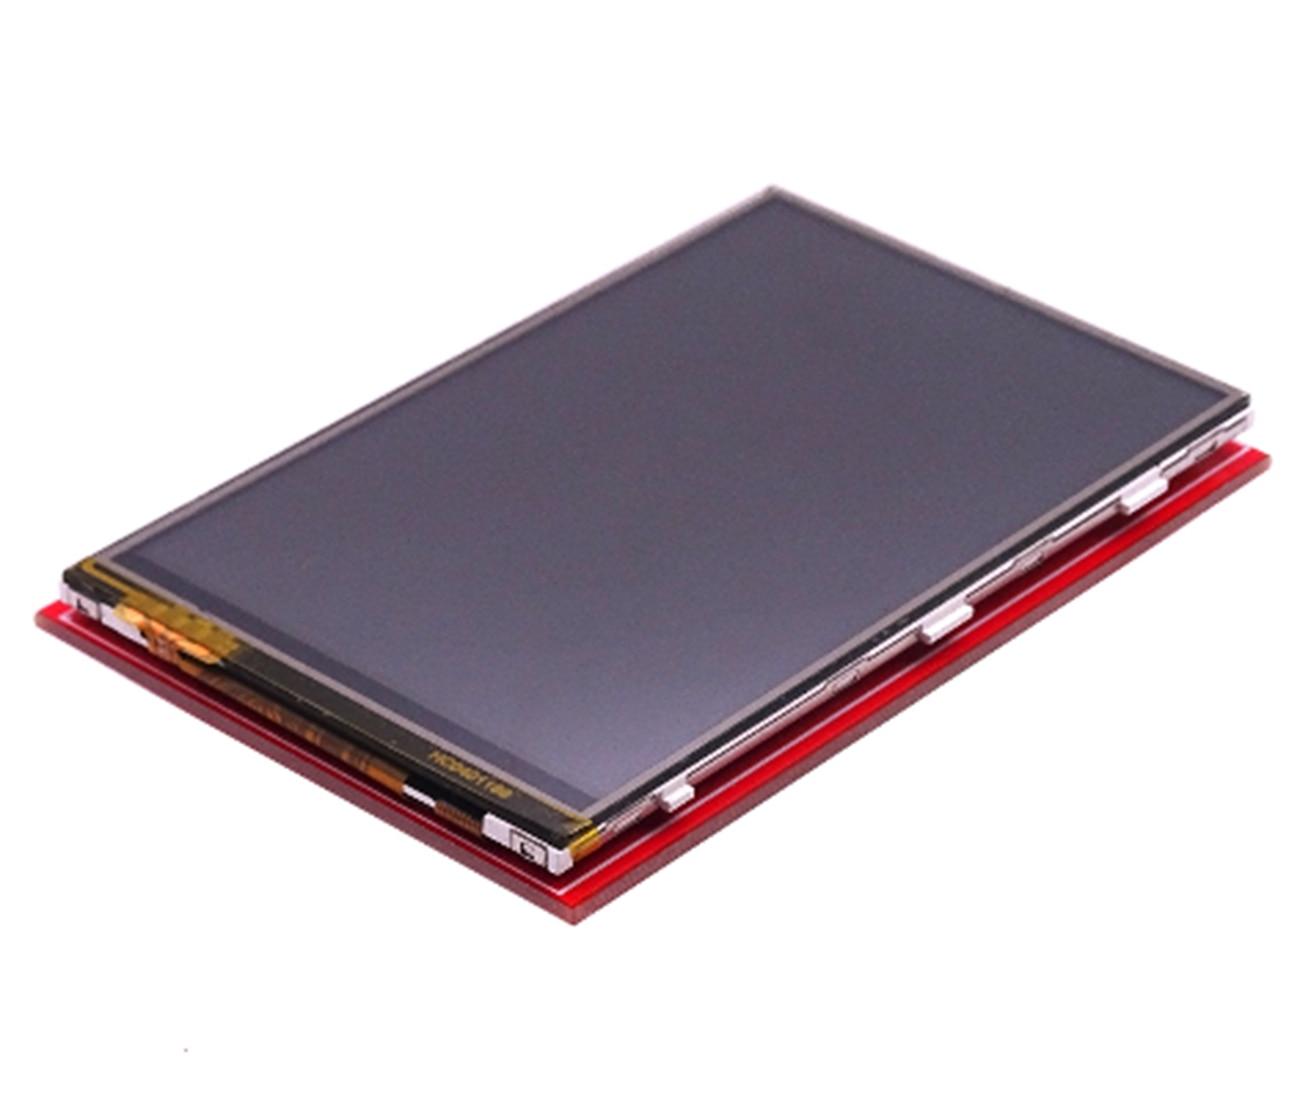 Tela touch screen lcd 3.5x480 para uno, 1 peça, 320 polegadas, tft, plug e play, display lcd placa para arduino